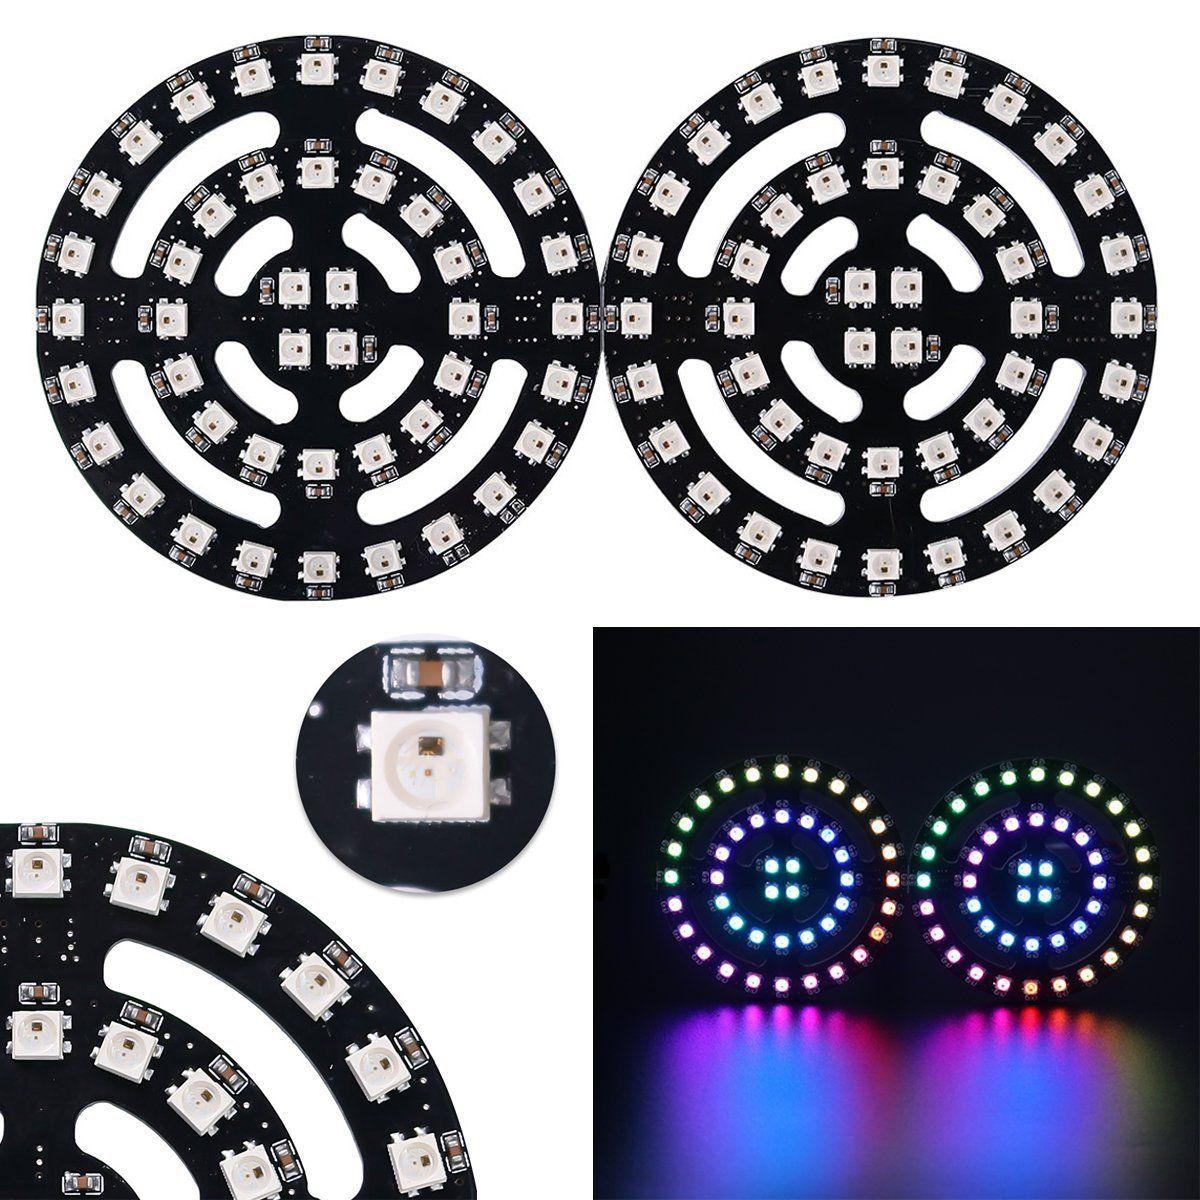 Integrated Drivers Addressable 1 8 12 16 24 32 Bits RGB LED Ring 5050 WS2812B